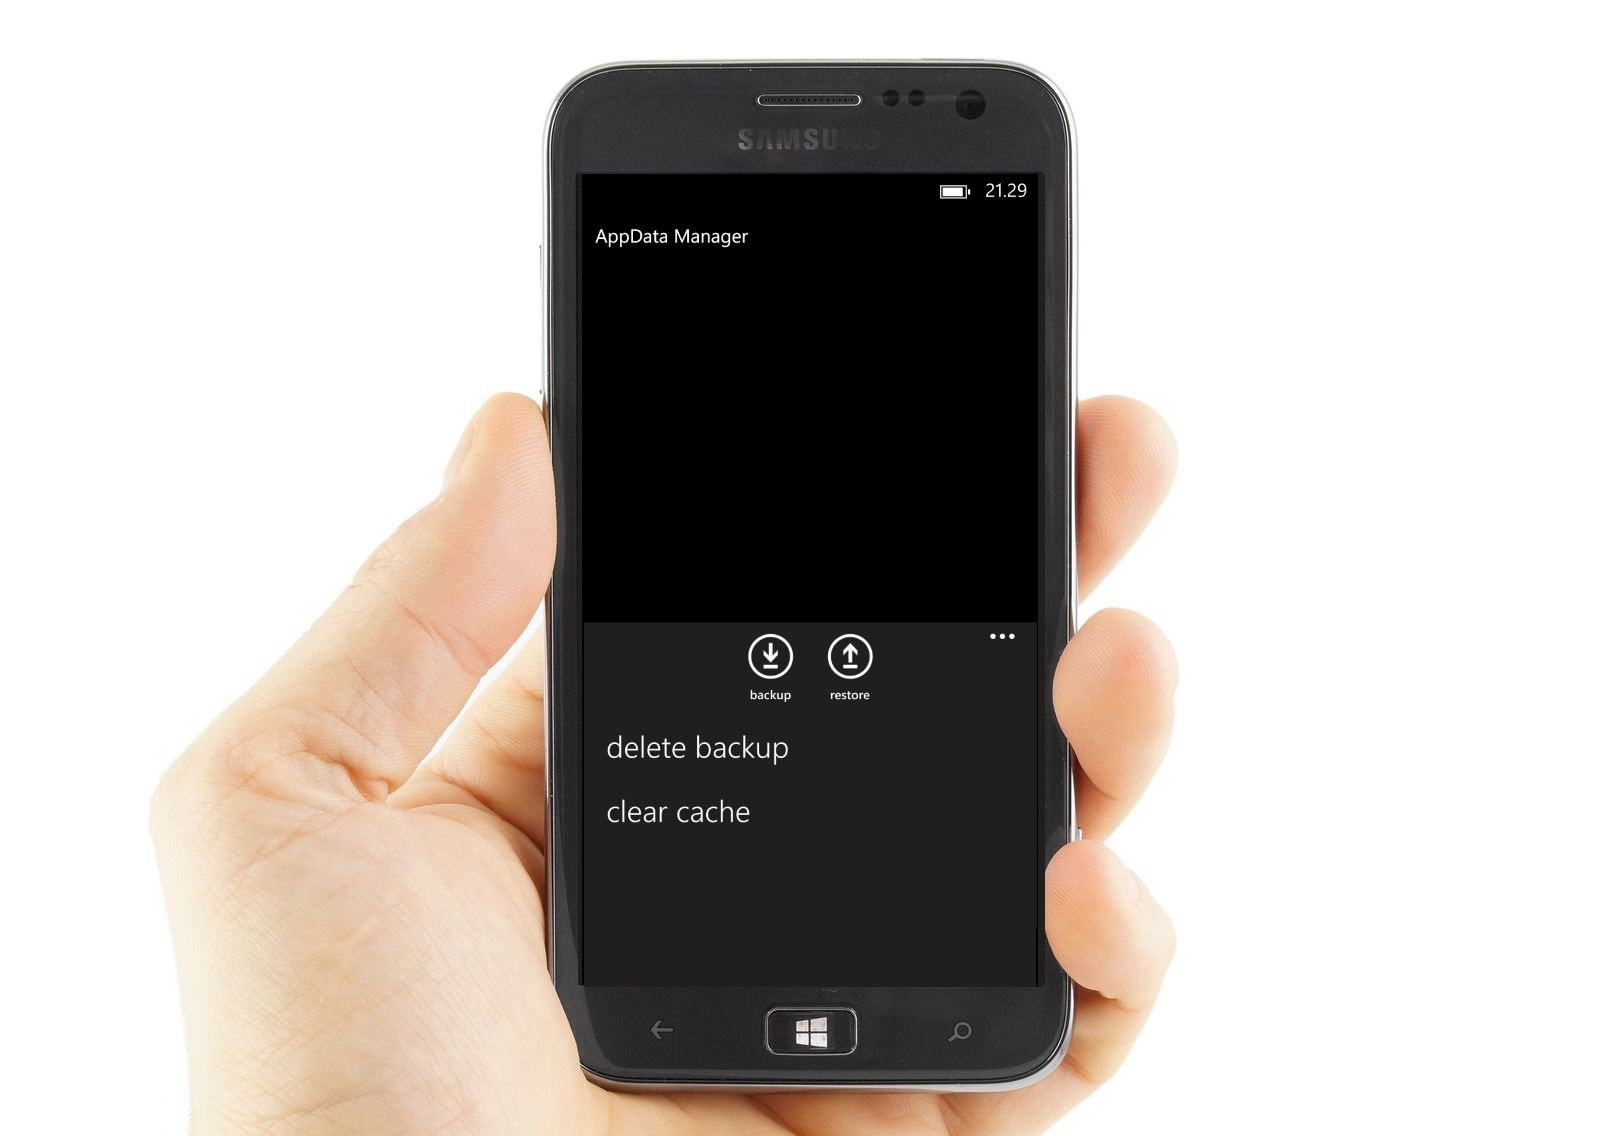 appdatamanager-samsung-ativ-s1